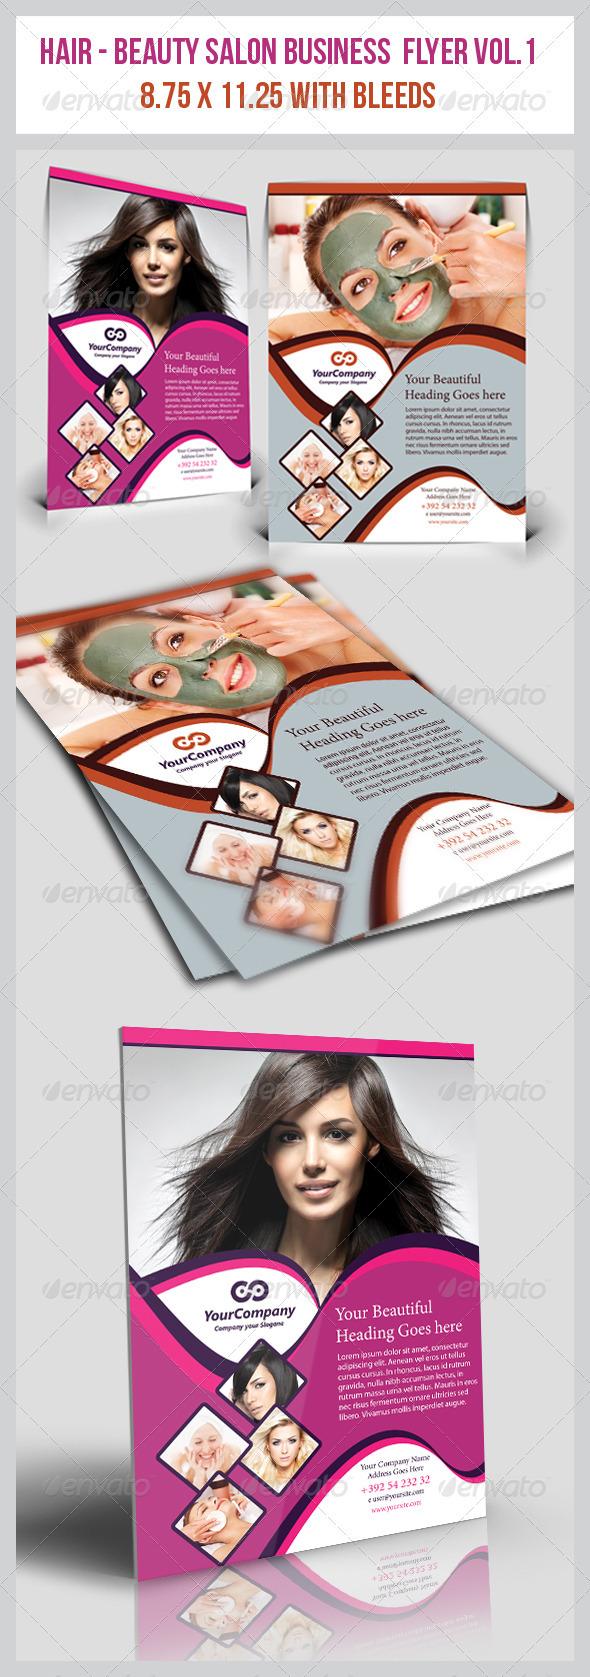 GraphicRiver Hair & Beauty Salon Business Flyer Vol.1 3721365